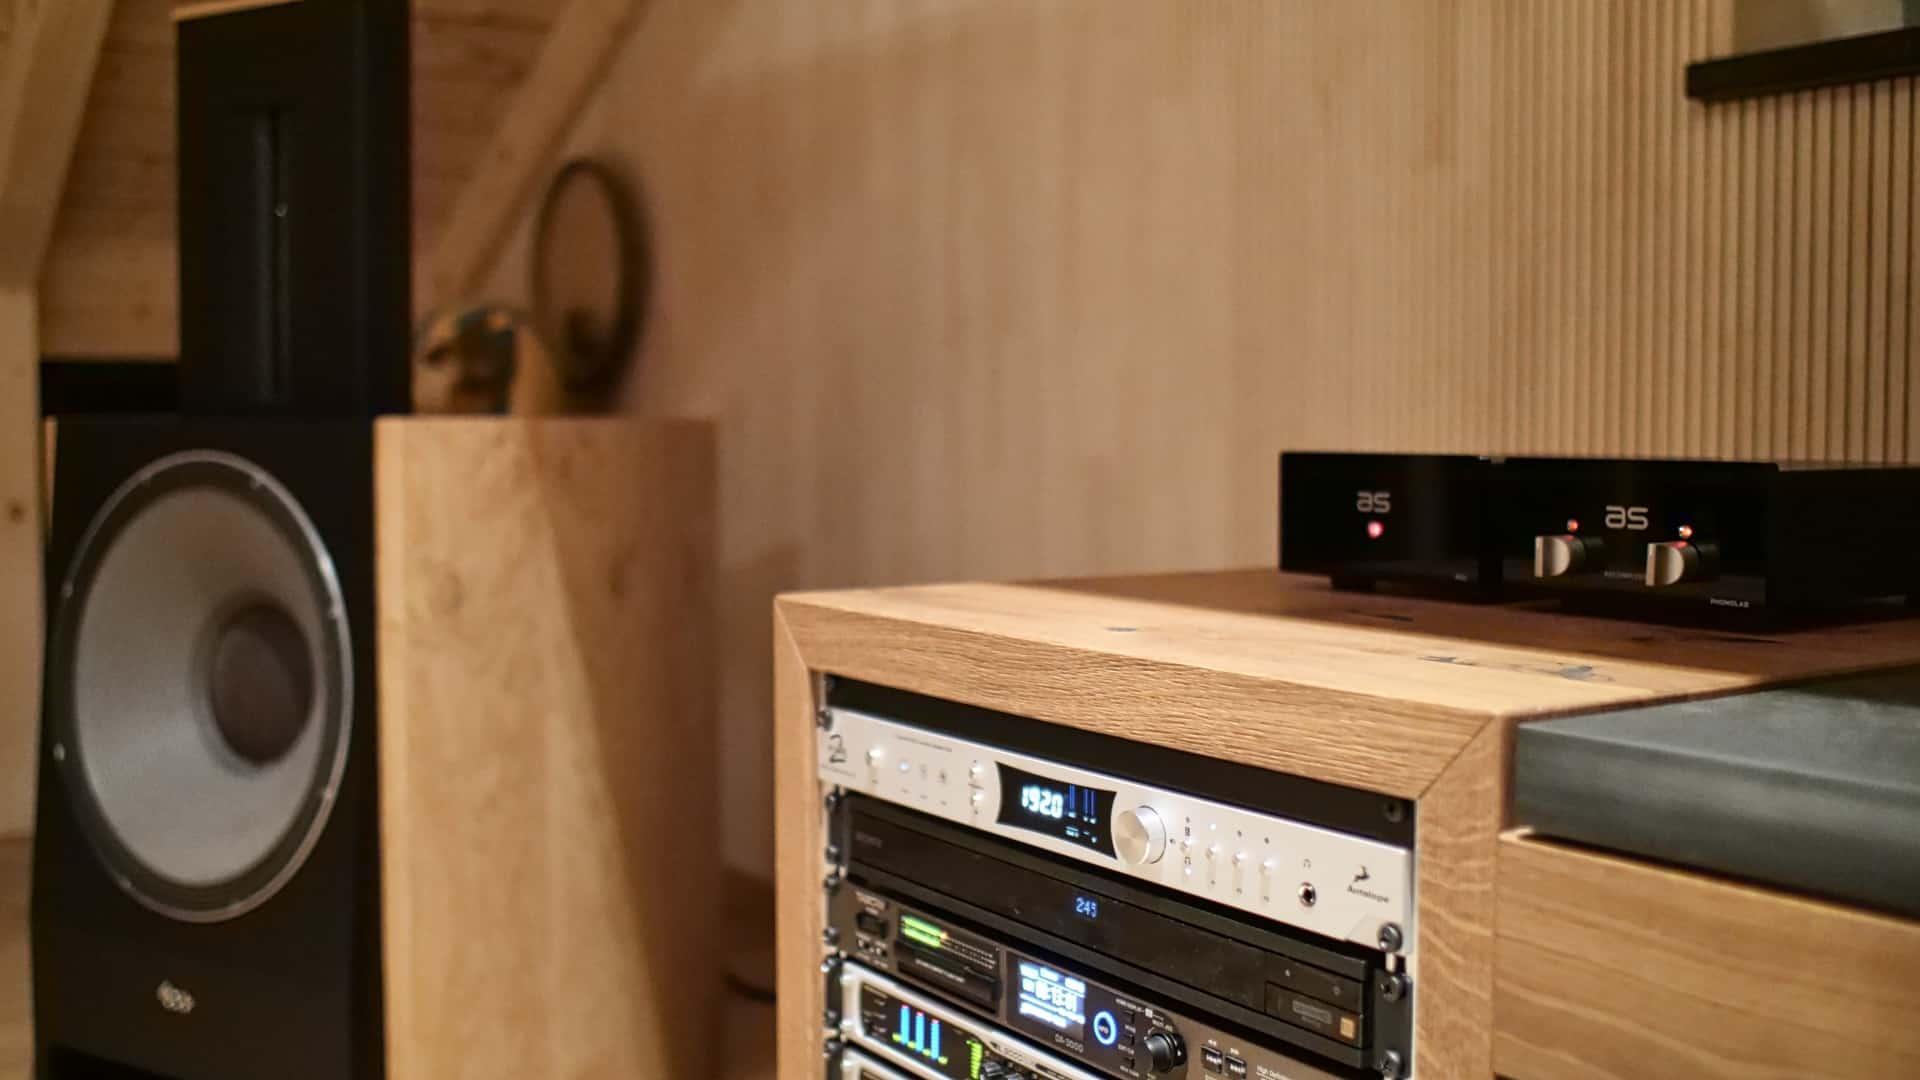 Phonovorstufe der Referenzklasse: Audiospecials Phonolab 6